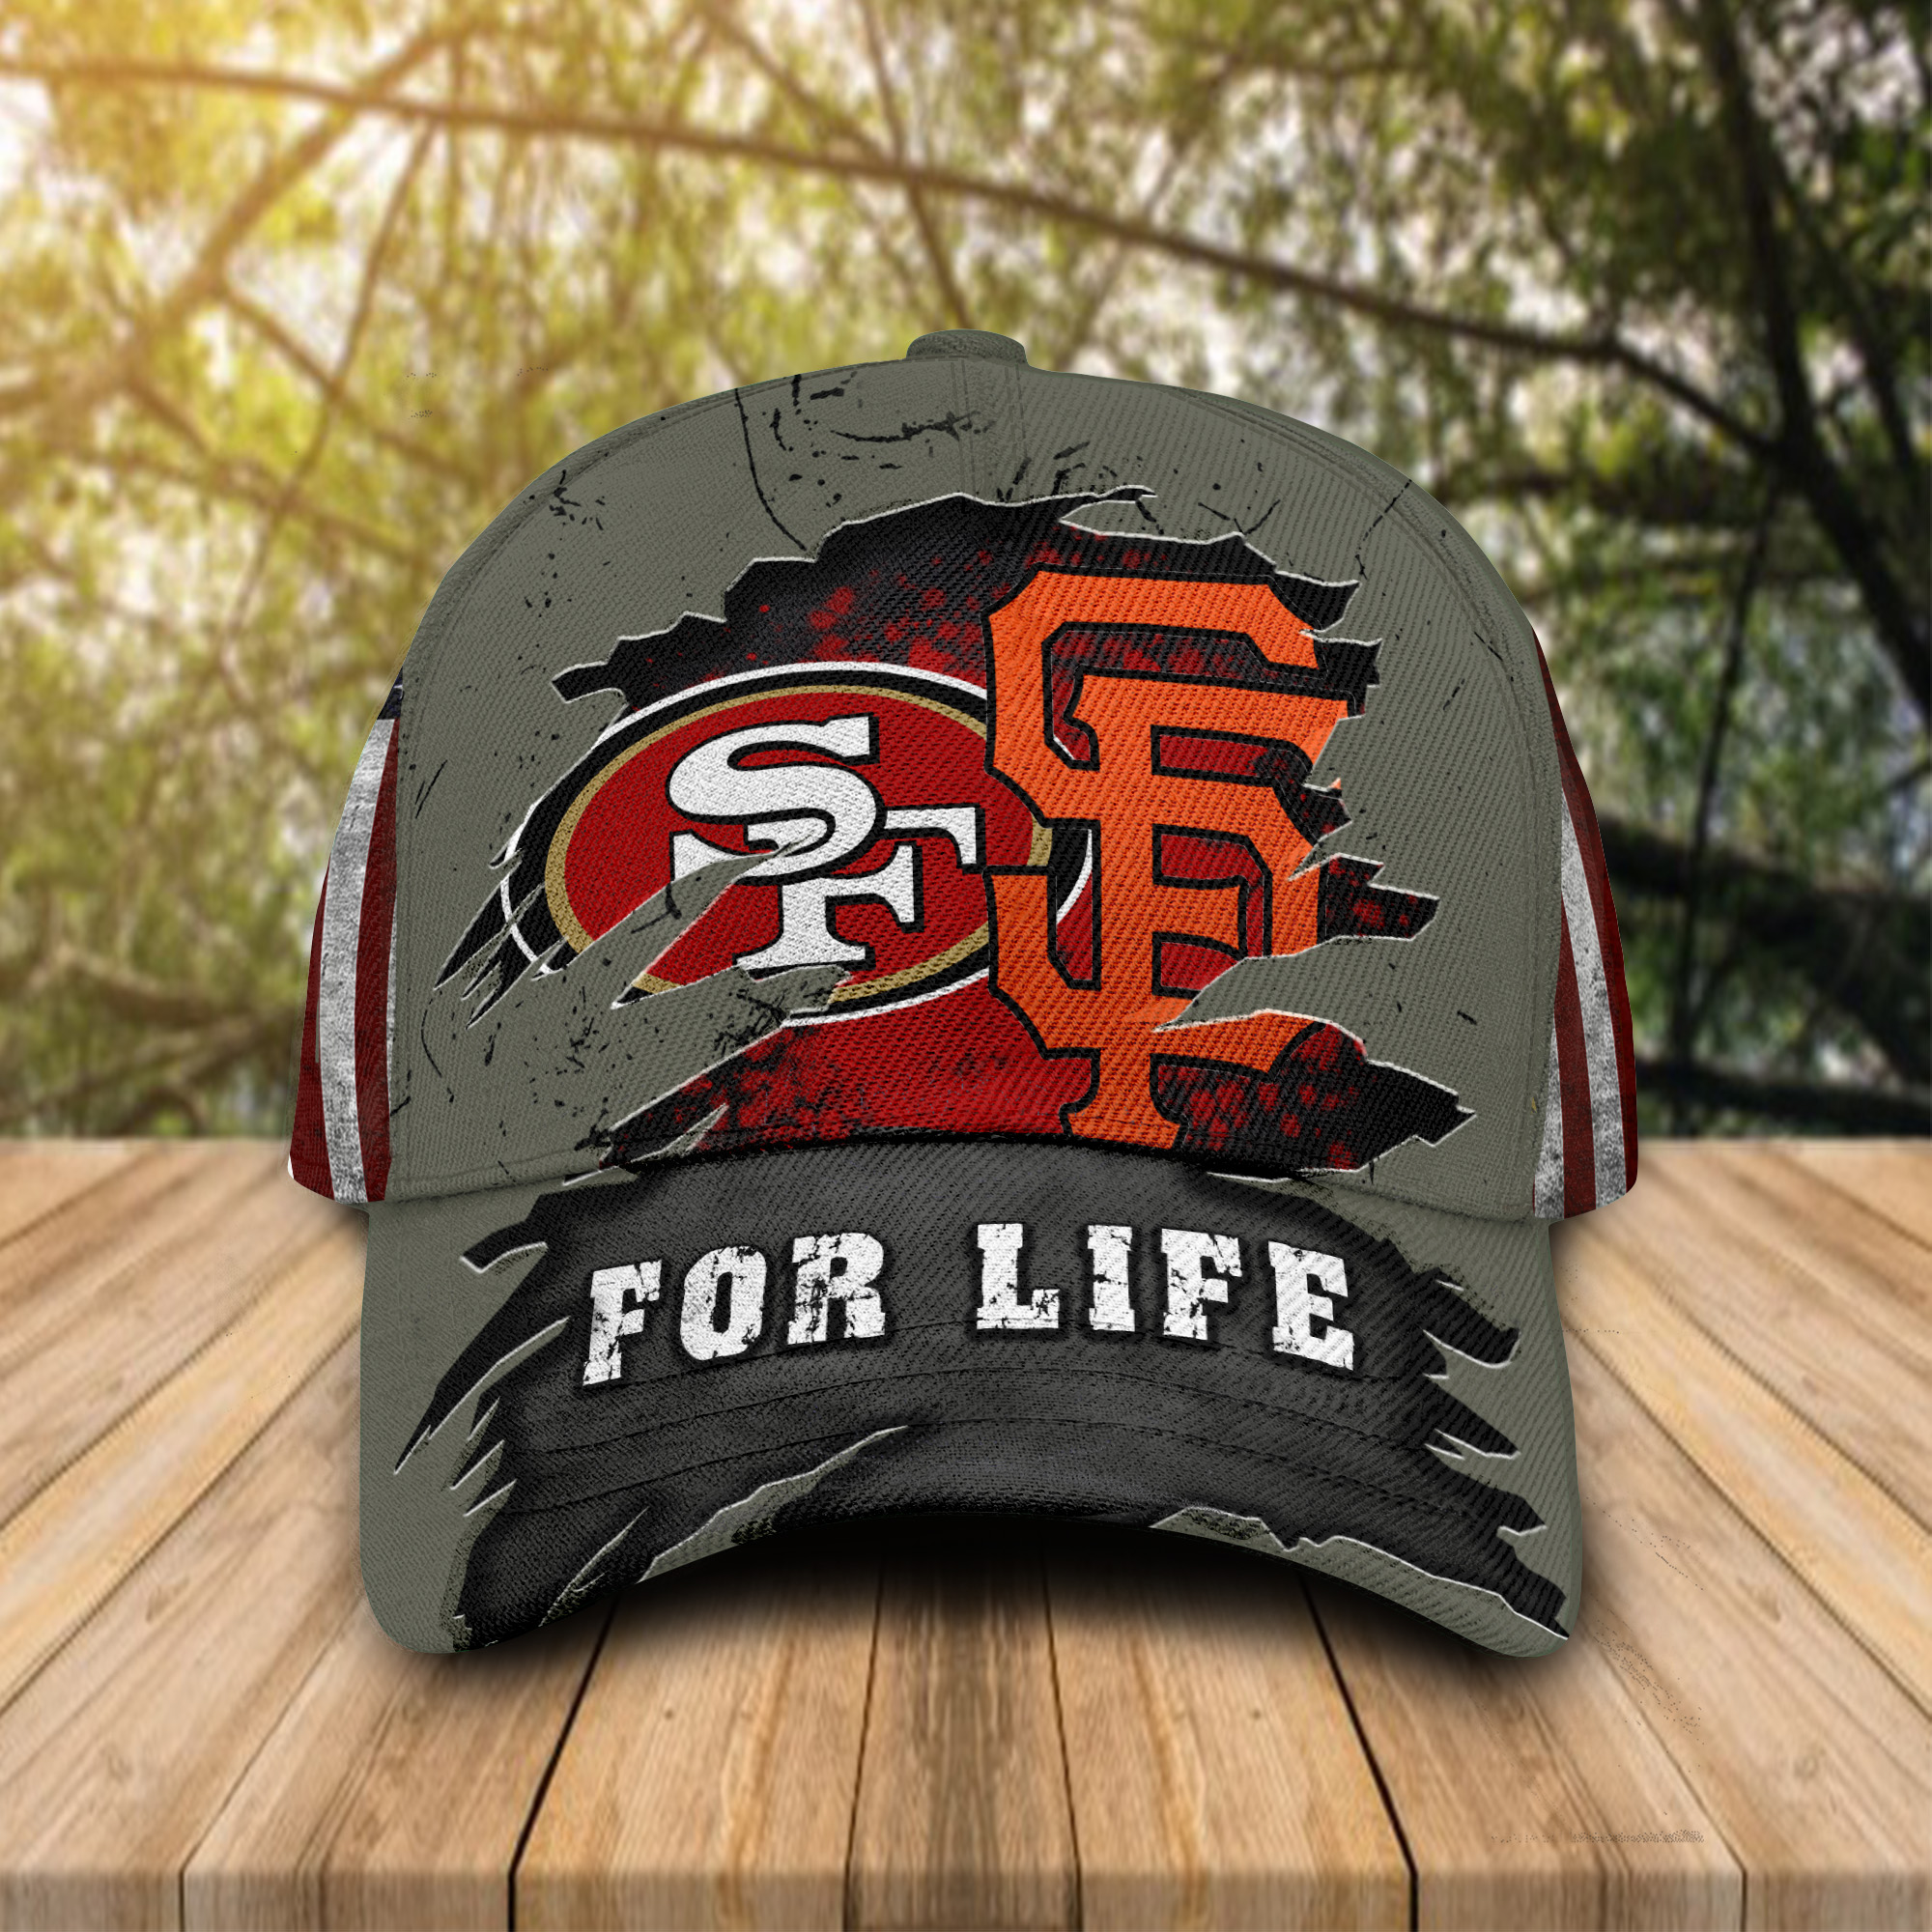 San Francisco 49ers Vs San Francisco Giants For Life Cap